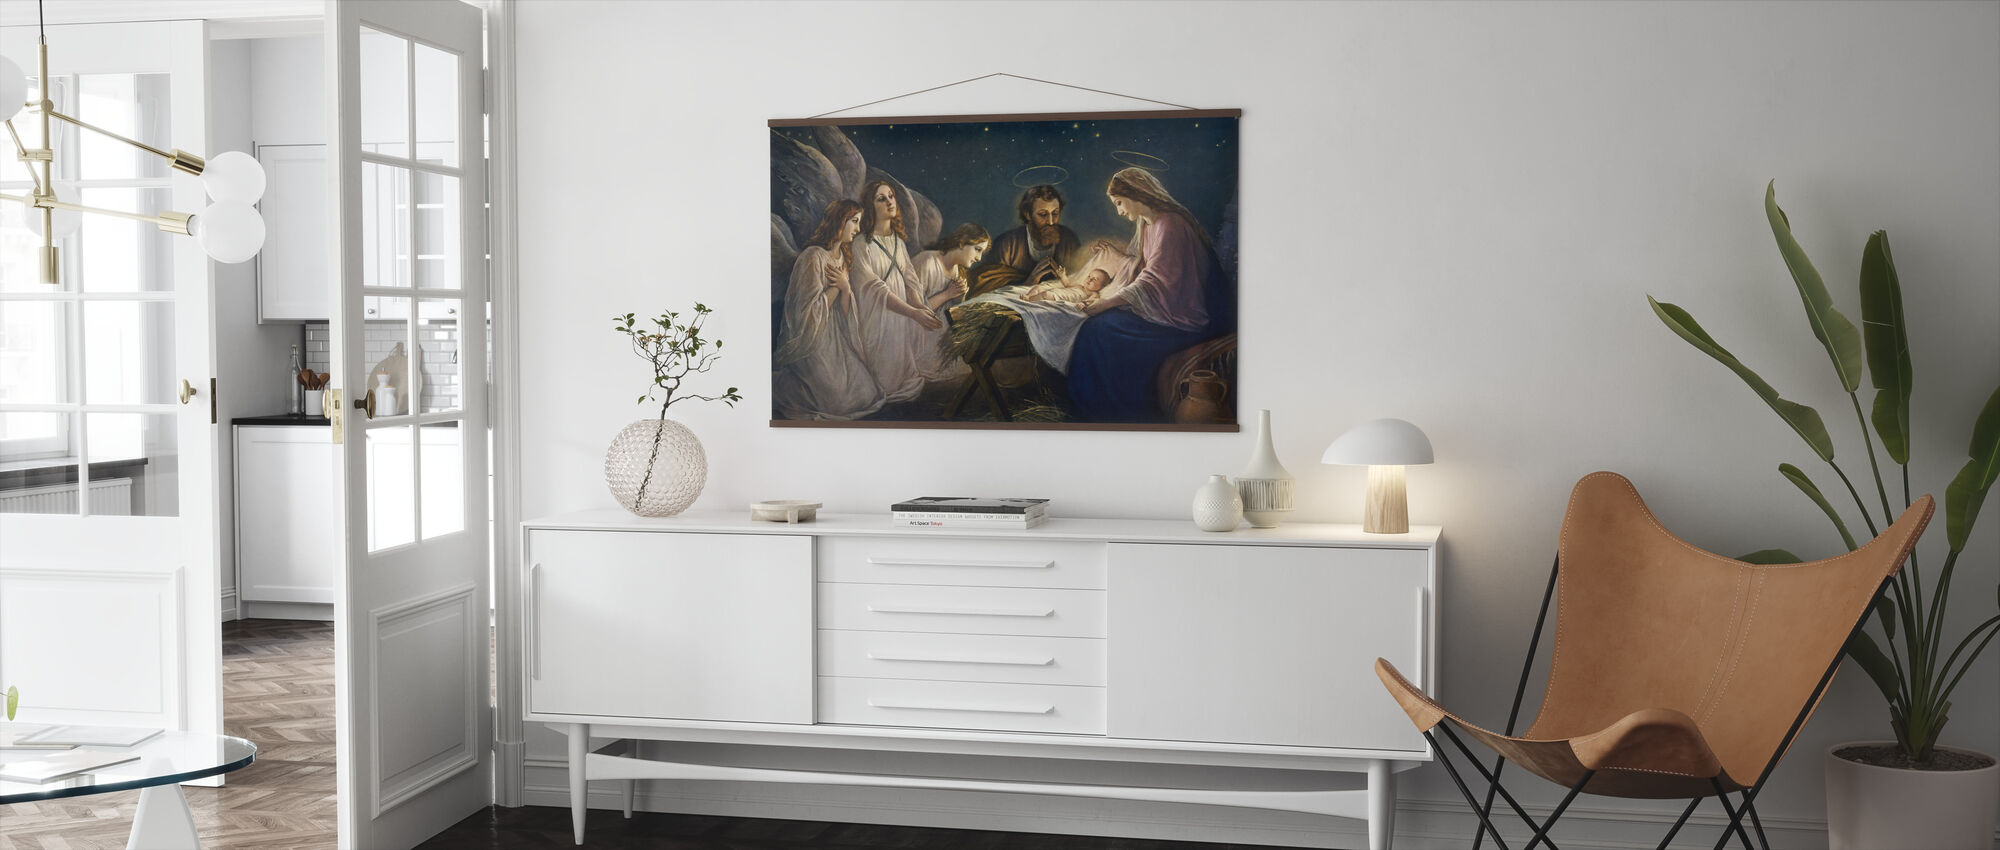 Jozef en Maria - Poster - Woonkamer